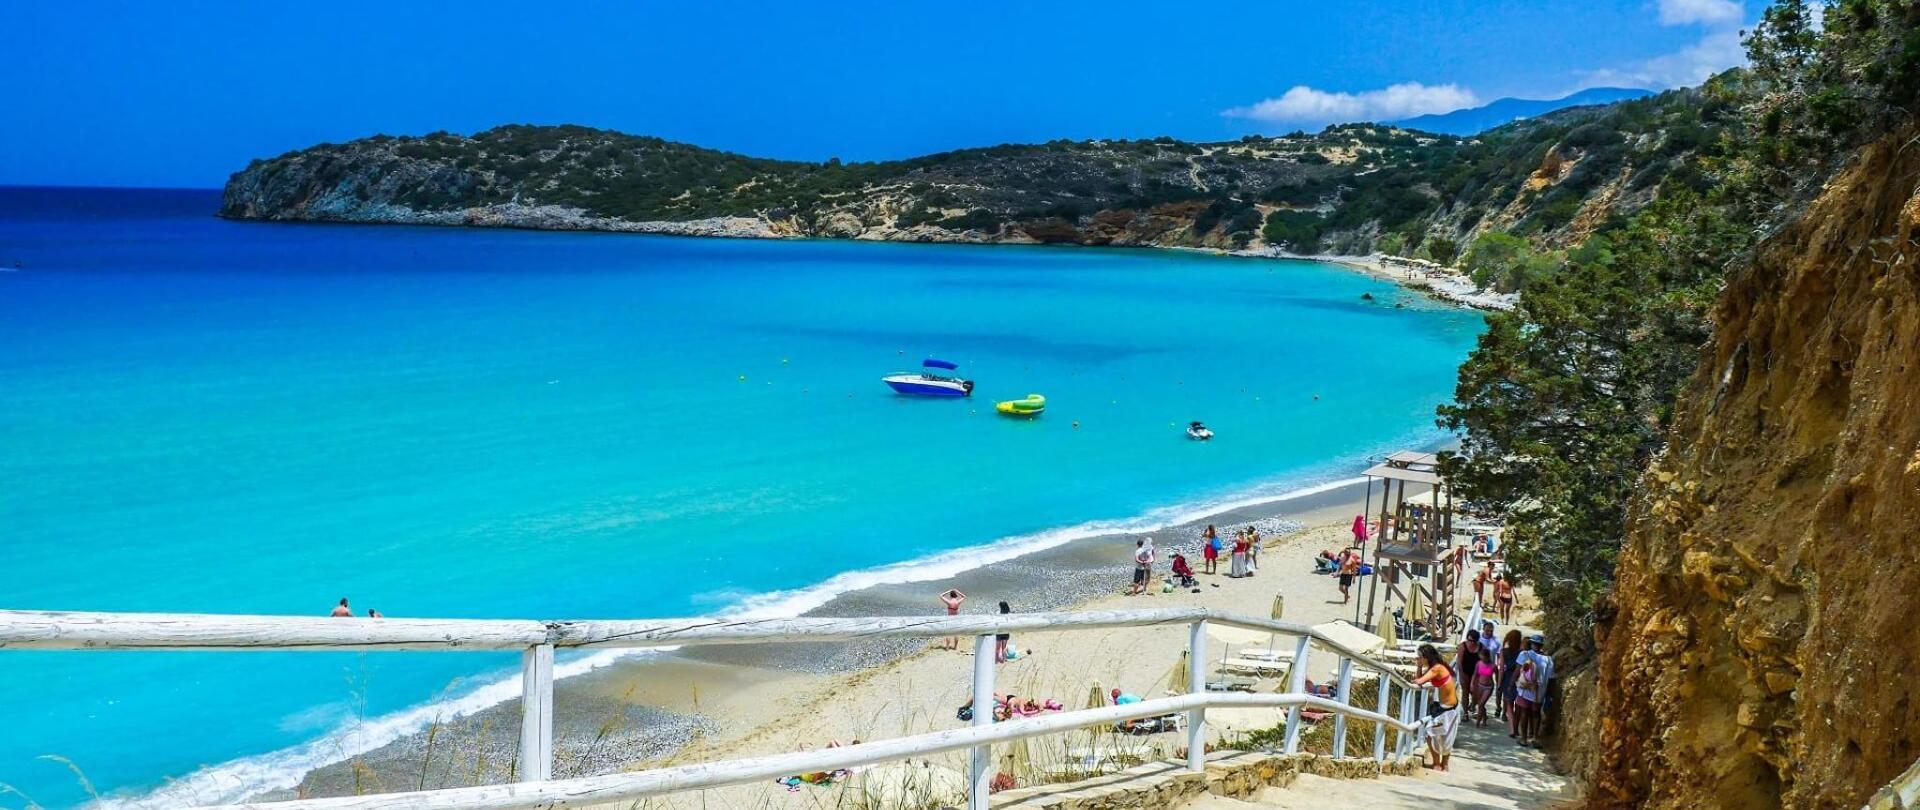 Voulisma-Strand-Agios-Nikolaos.jpg